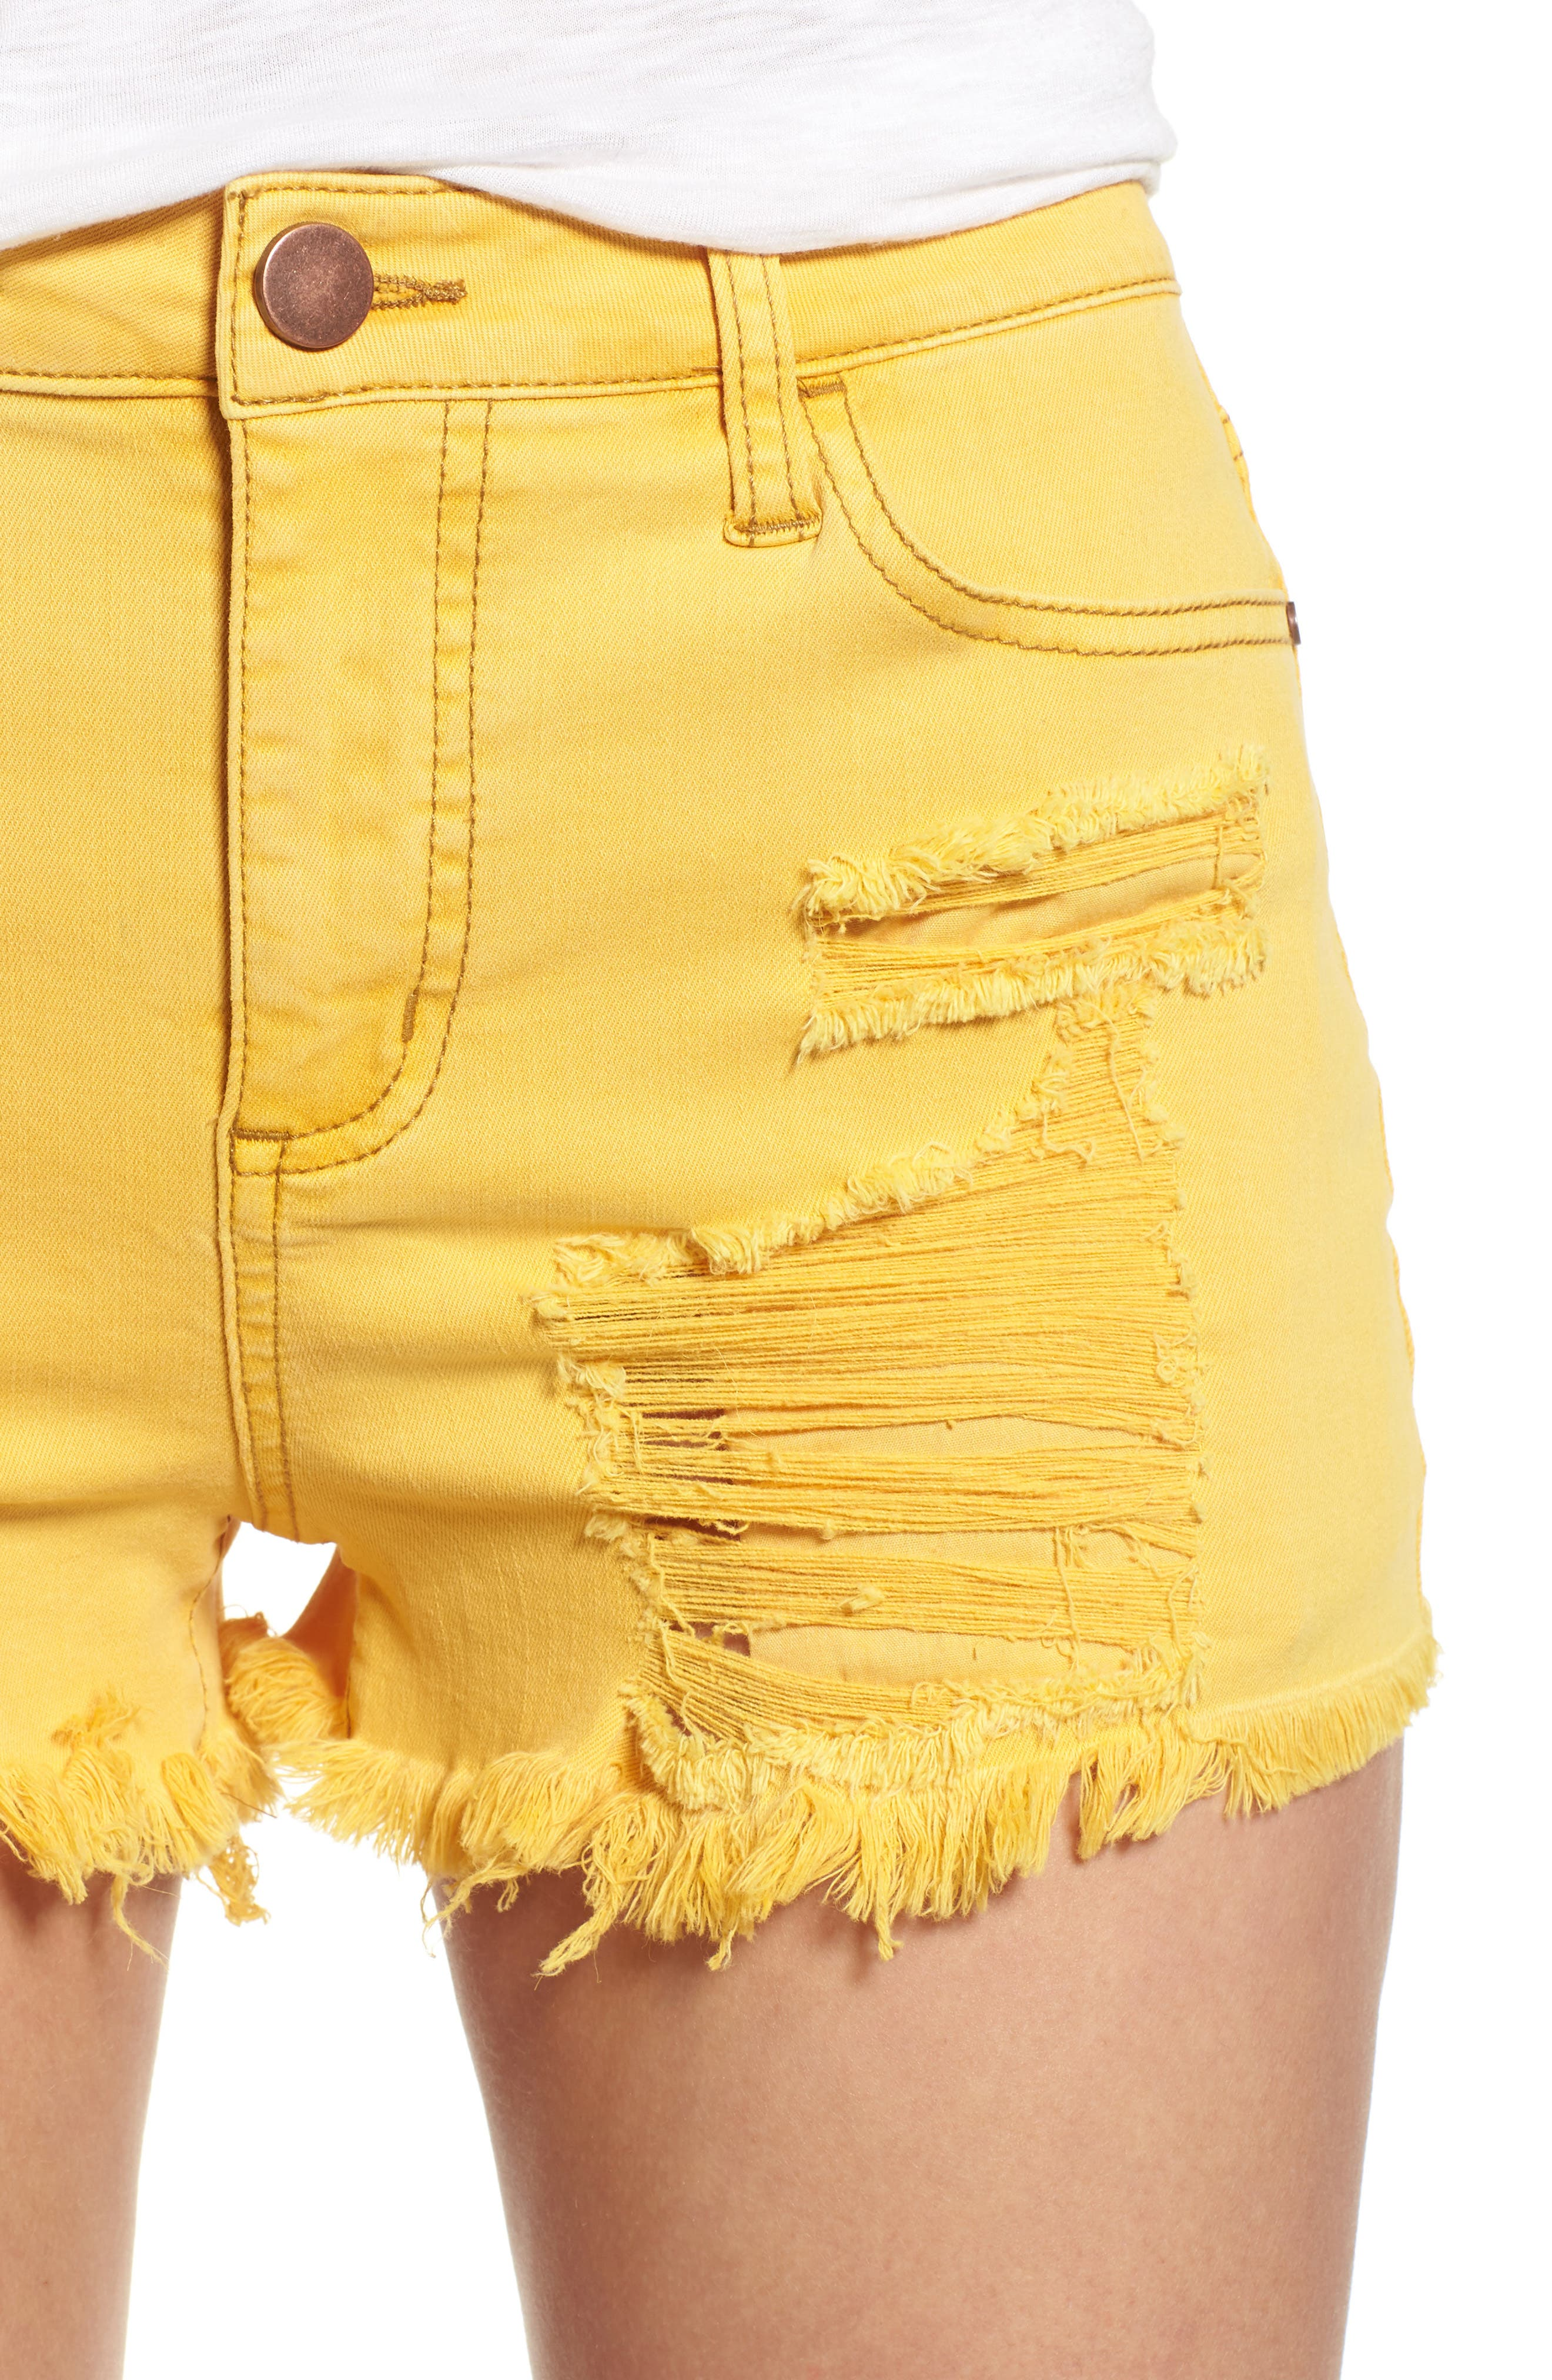 Decon Ripped Denim Shorts,                             Alternate thumbnail 4, color,                             Marigold